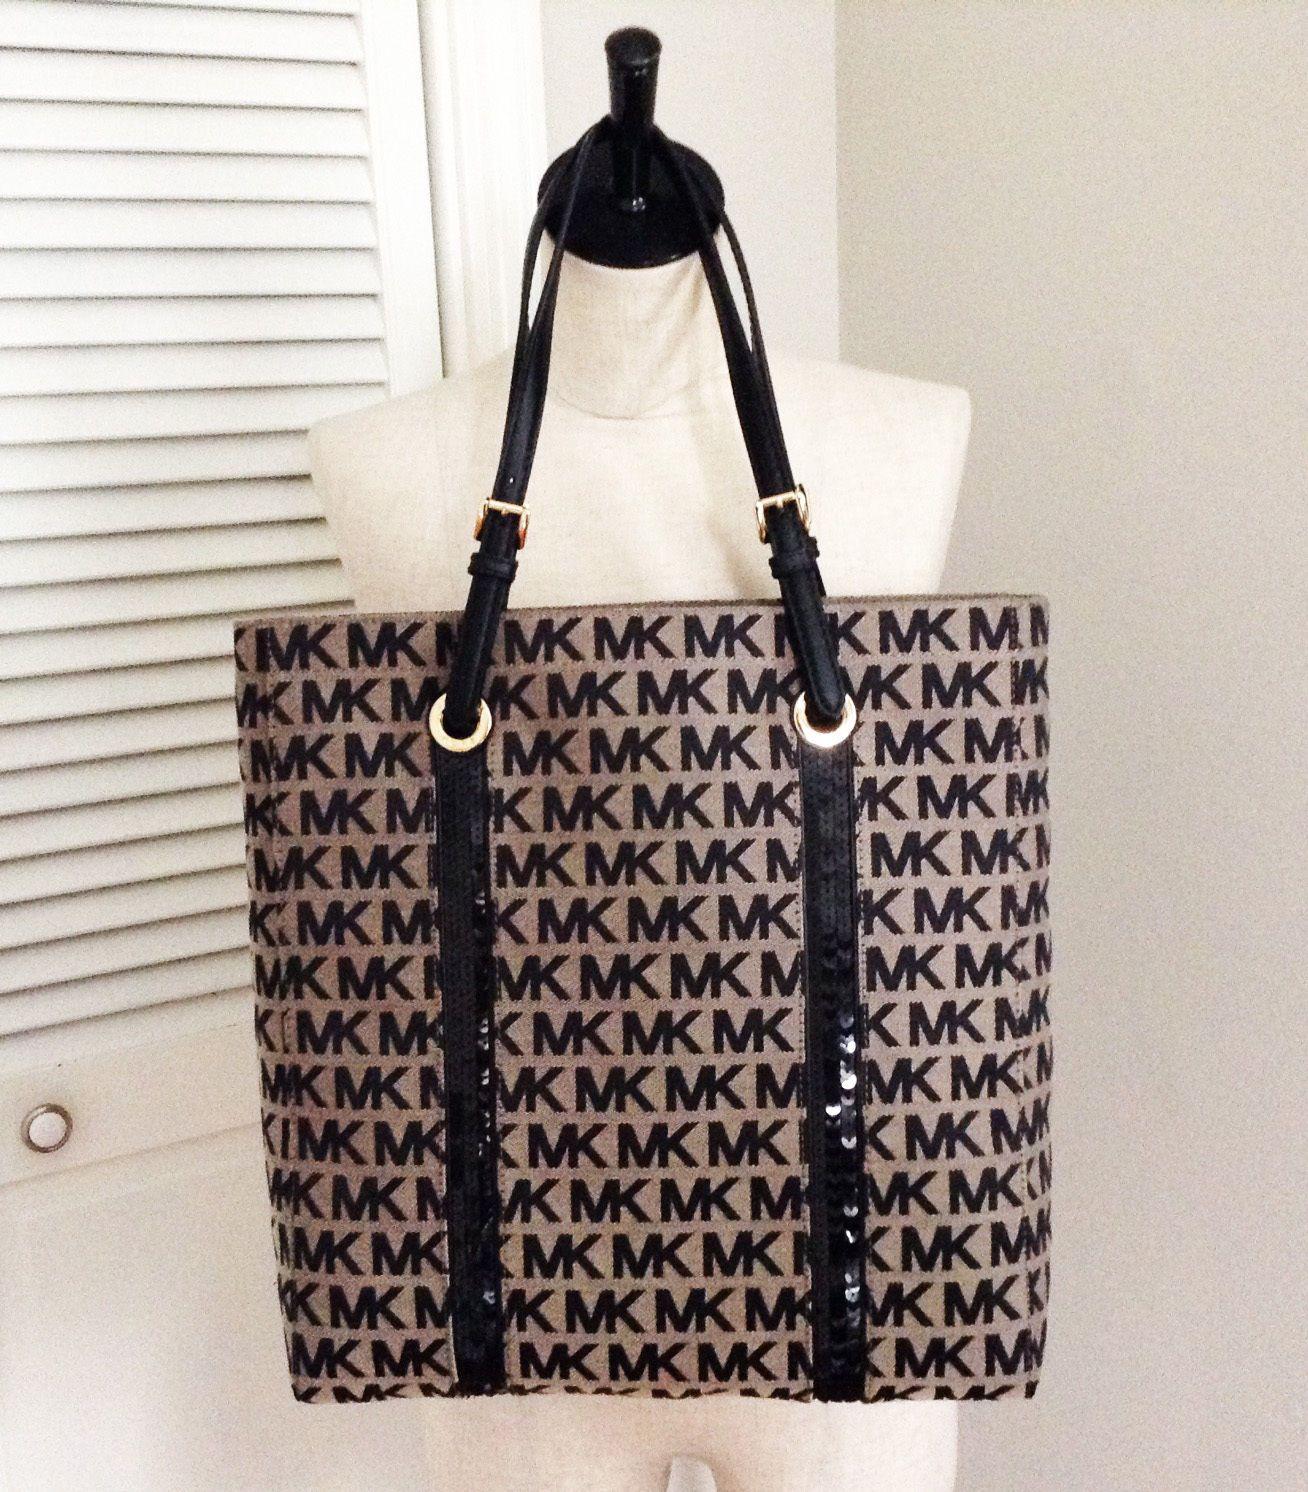 NWT Michael Kors Handbag Purse Sequin Stripes Ns Tote Black Bag Mk ... 1337b86adcab5